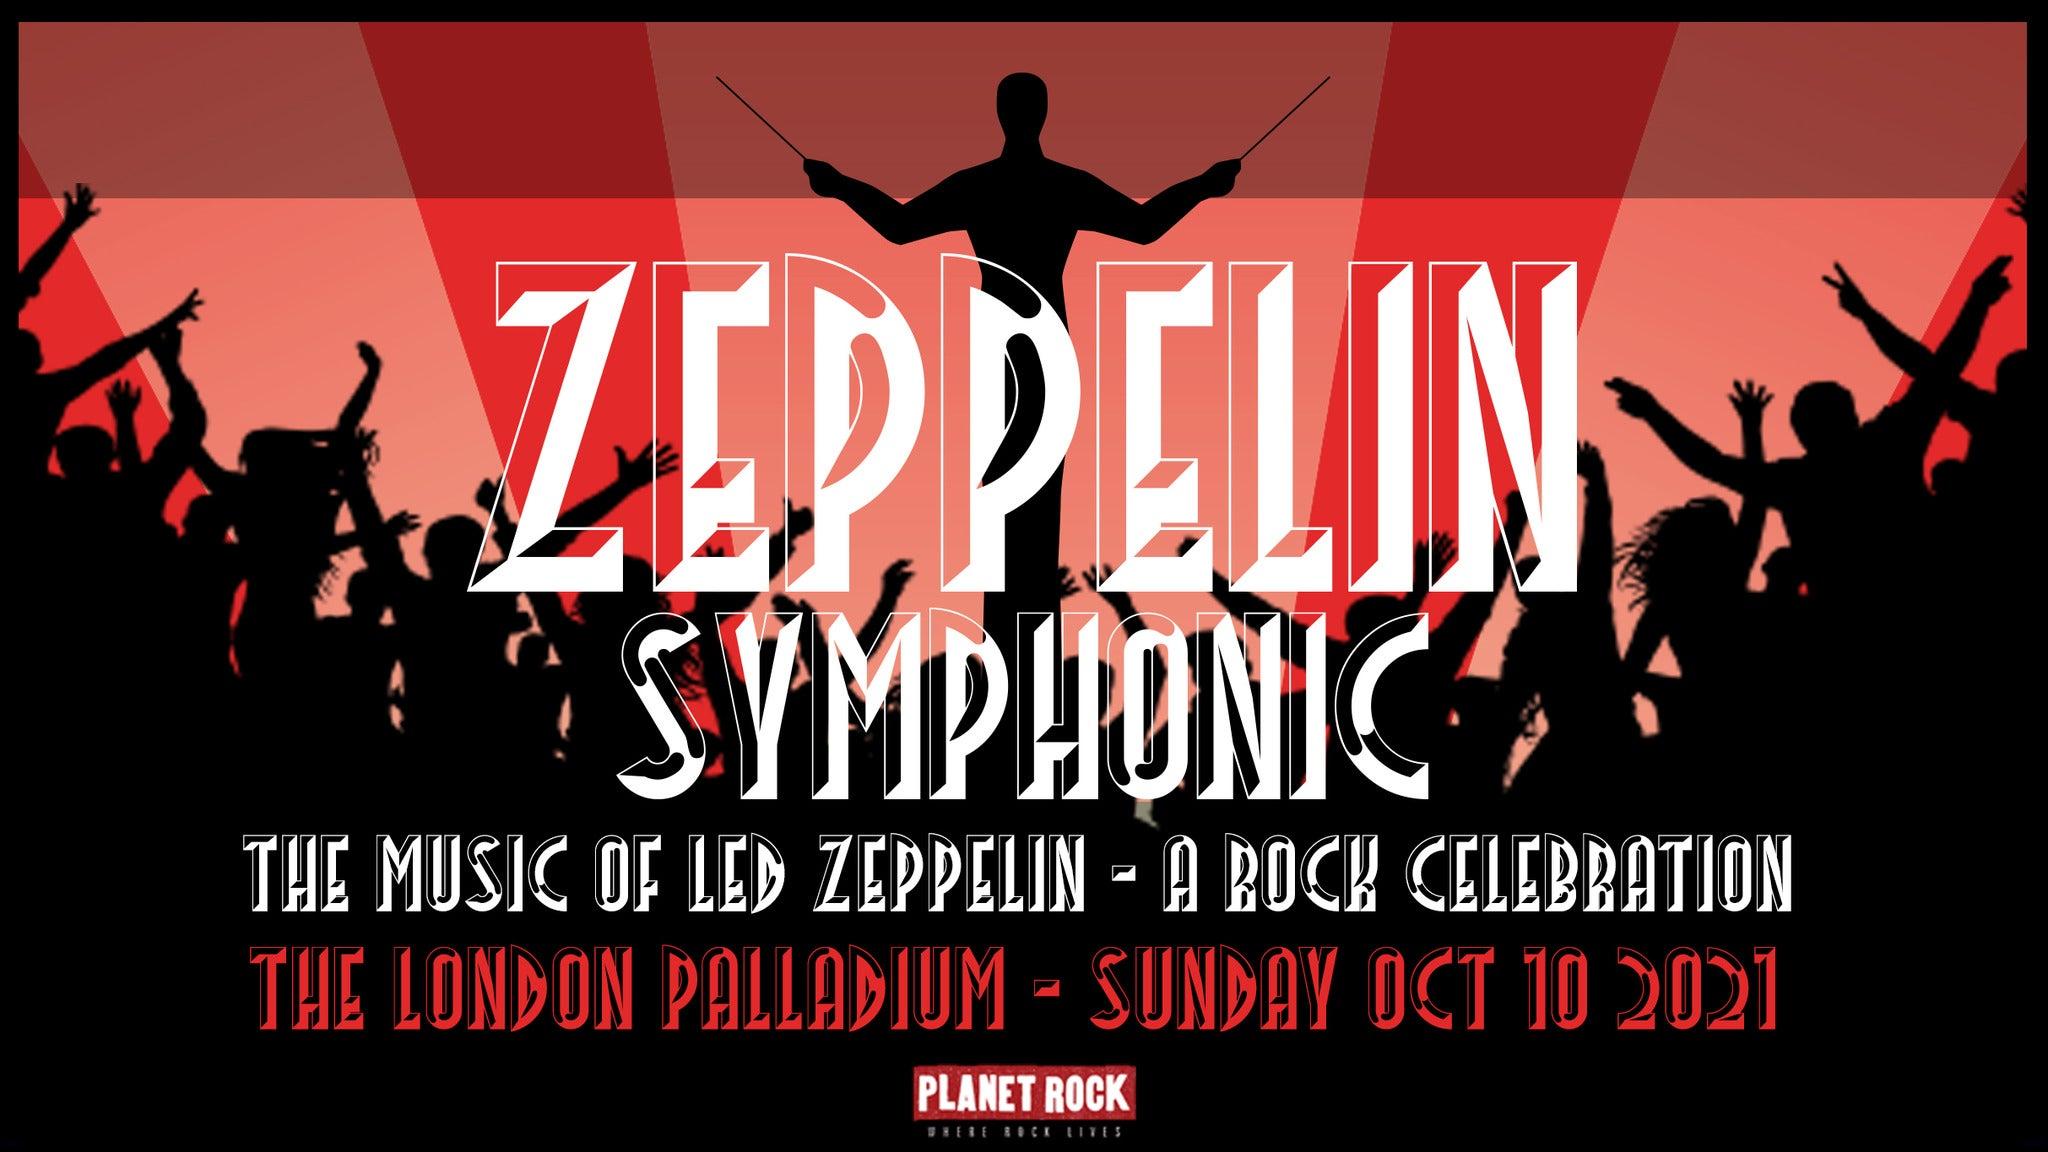 Zeppelin Symphonic, The Music of Led Zeppelin - a Rock Celebration London Palladium Seating Plan